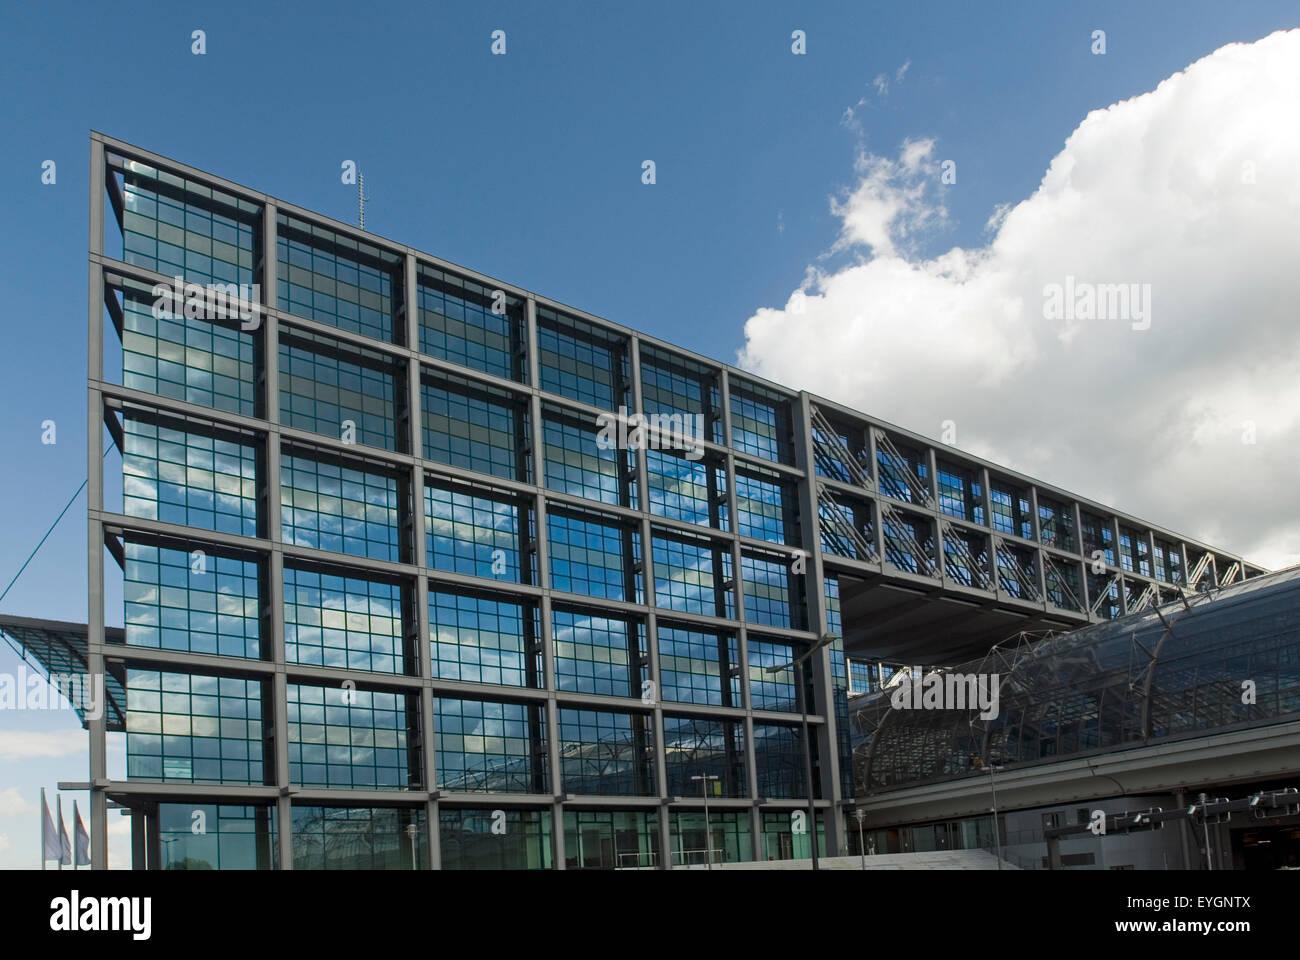 Railway Station Lehrter Berlin Germany Europe - Stock Image